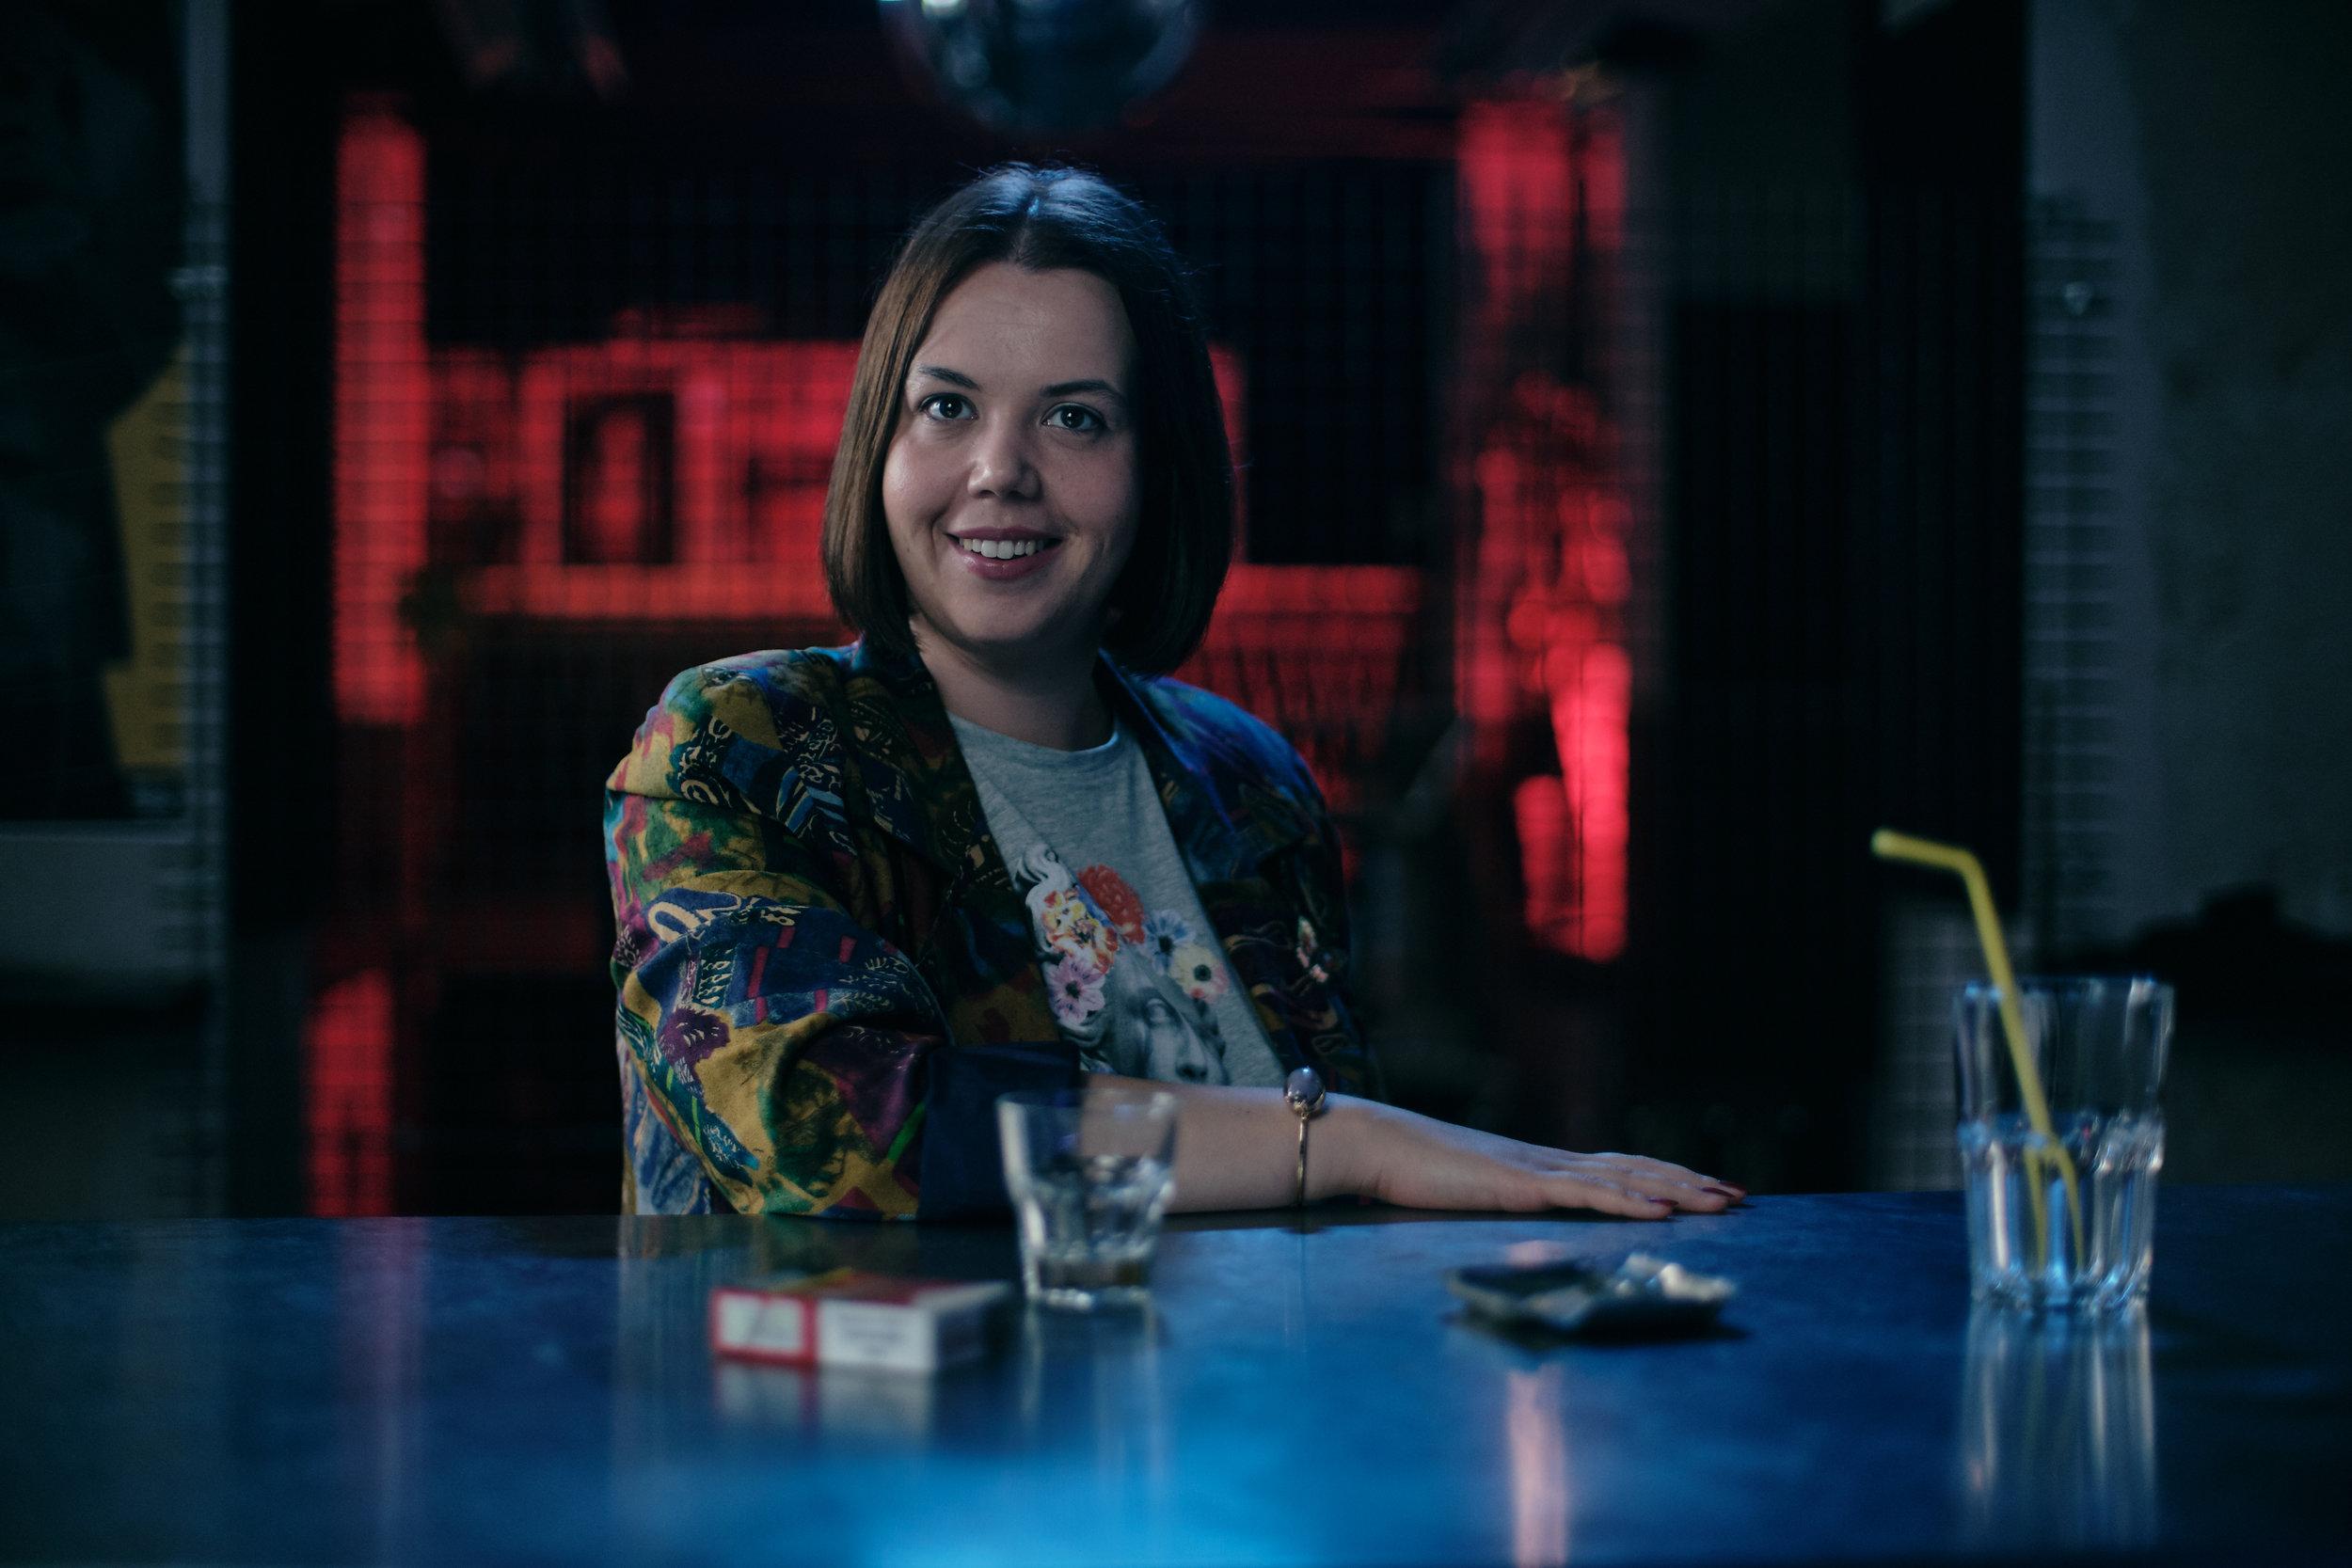 'LP, Lena' season 2 (2019)    Production: Veto    Director: Ema Muc    DOP: Dejan Ulaga    In frame: Sara Dirnbek